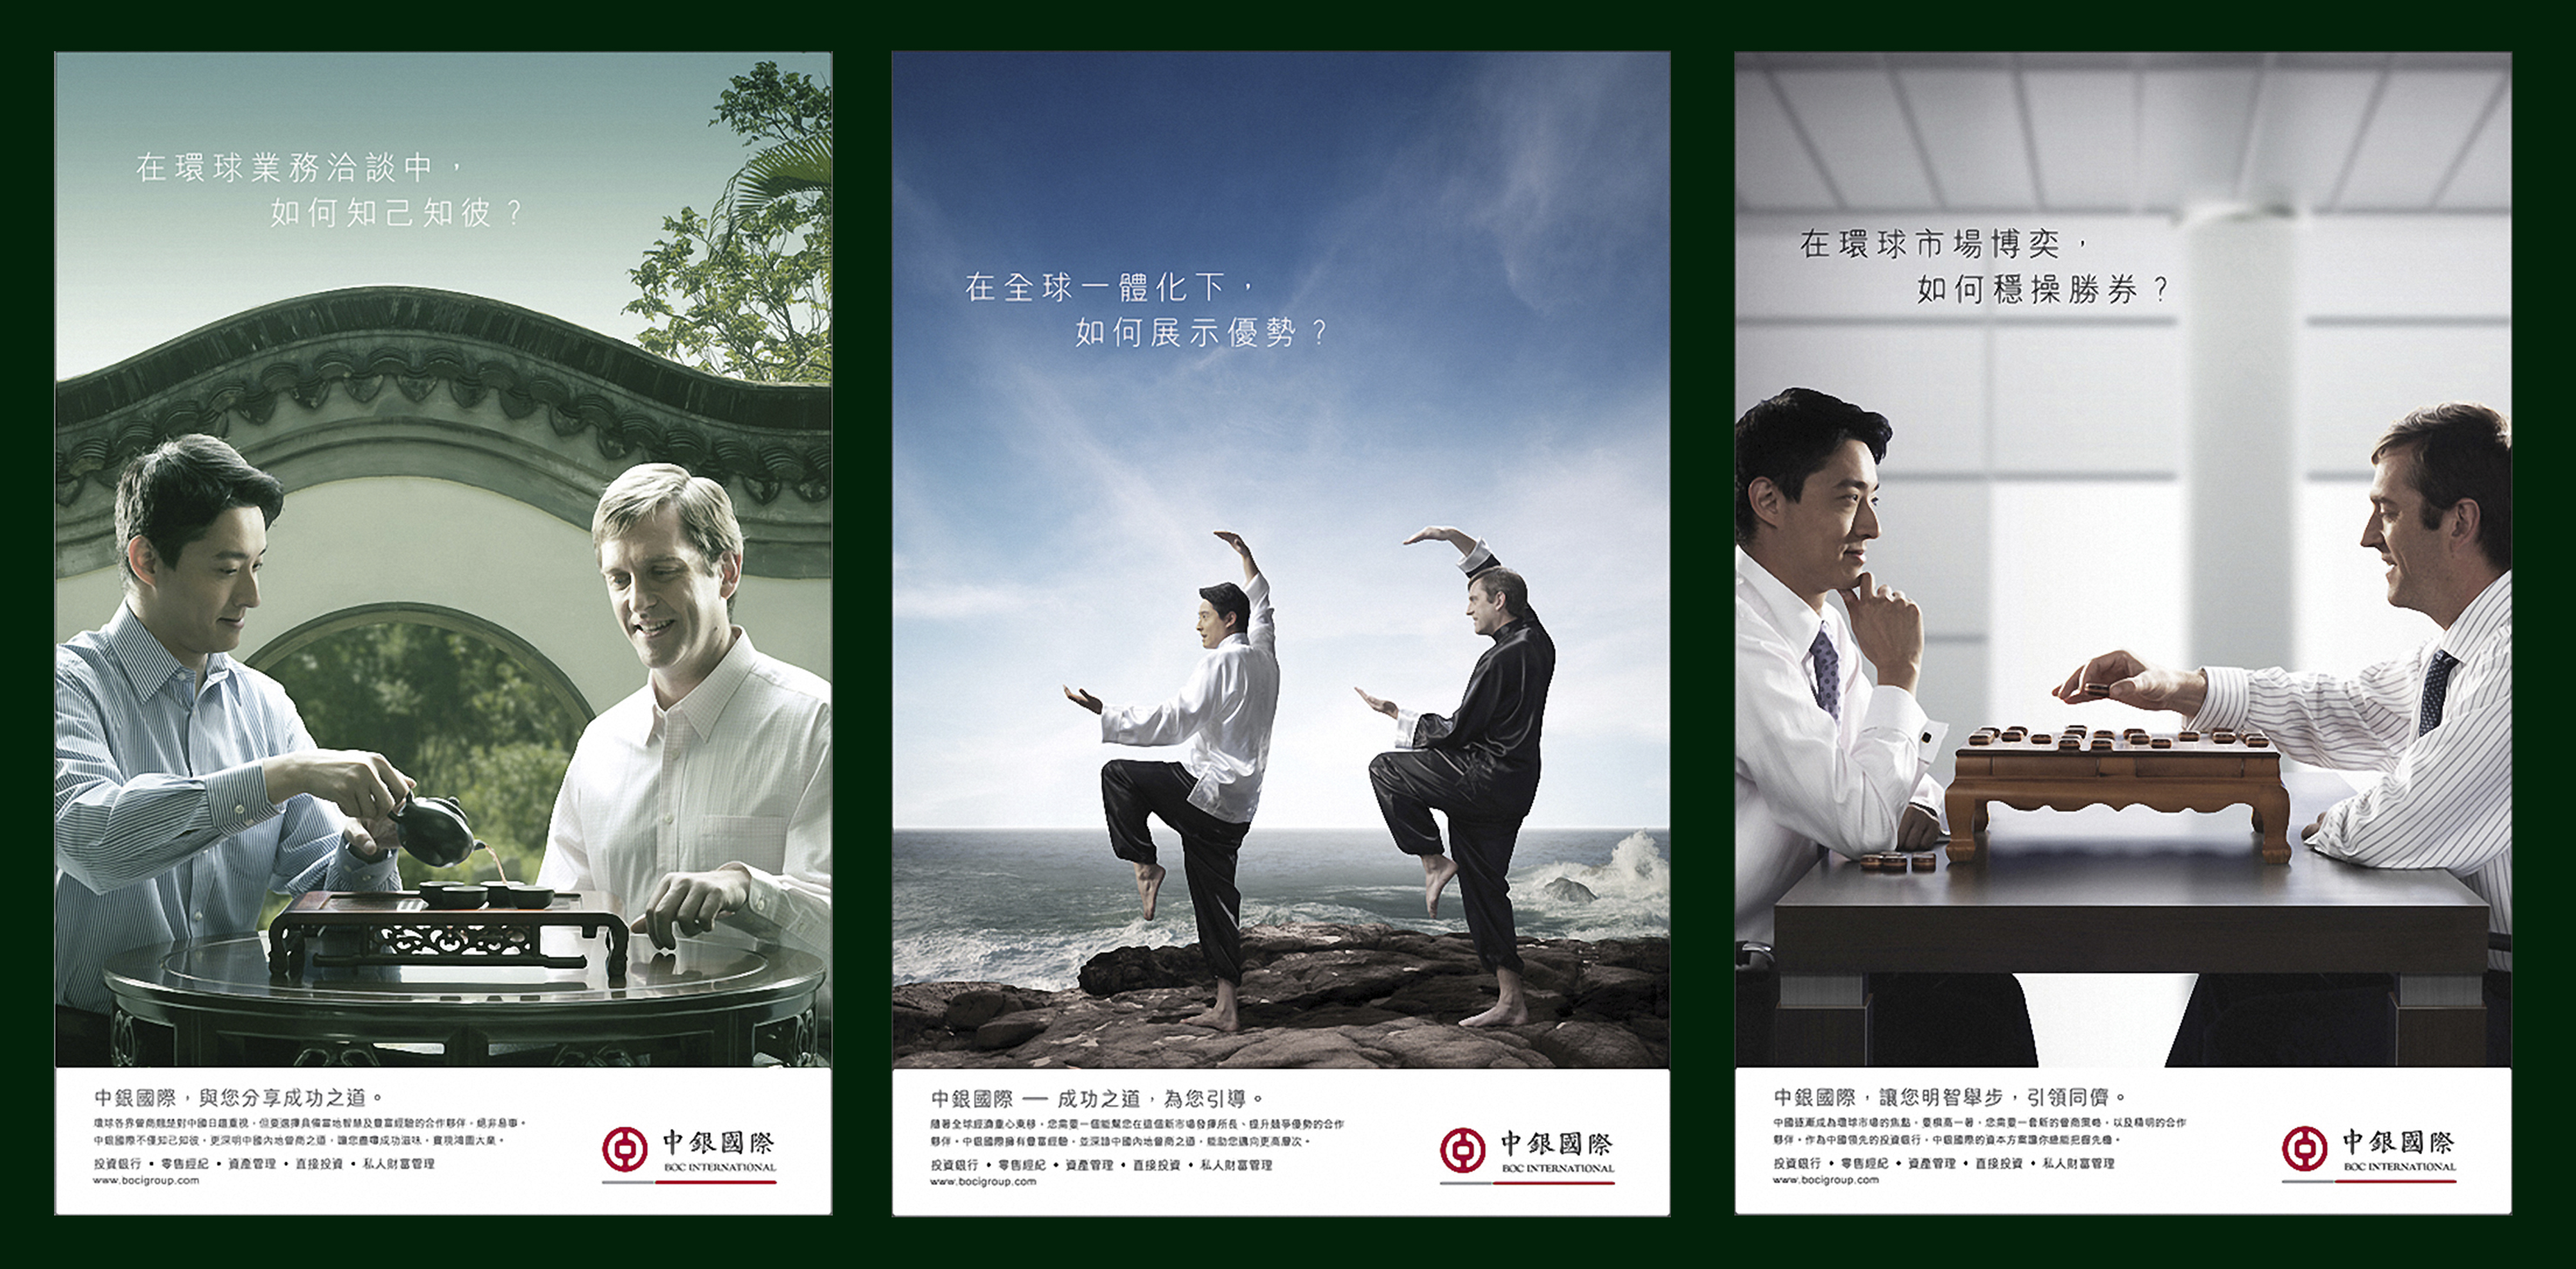 Bank of China International Campaign